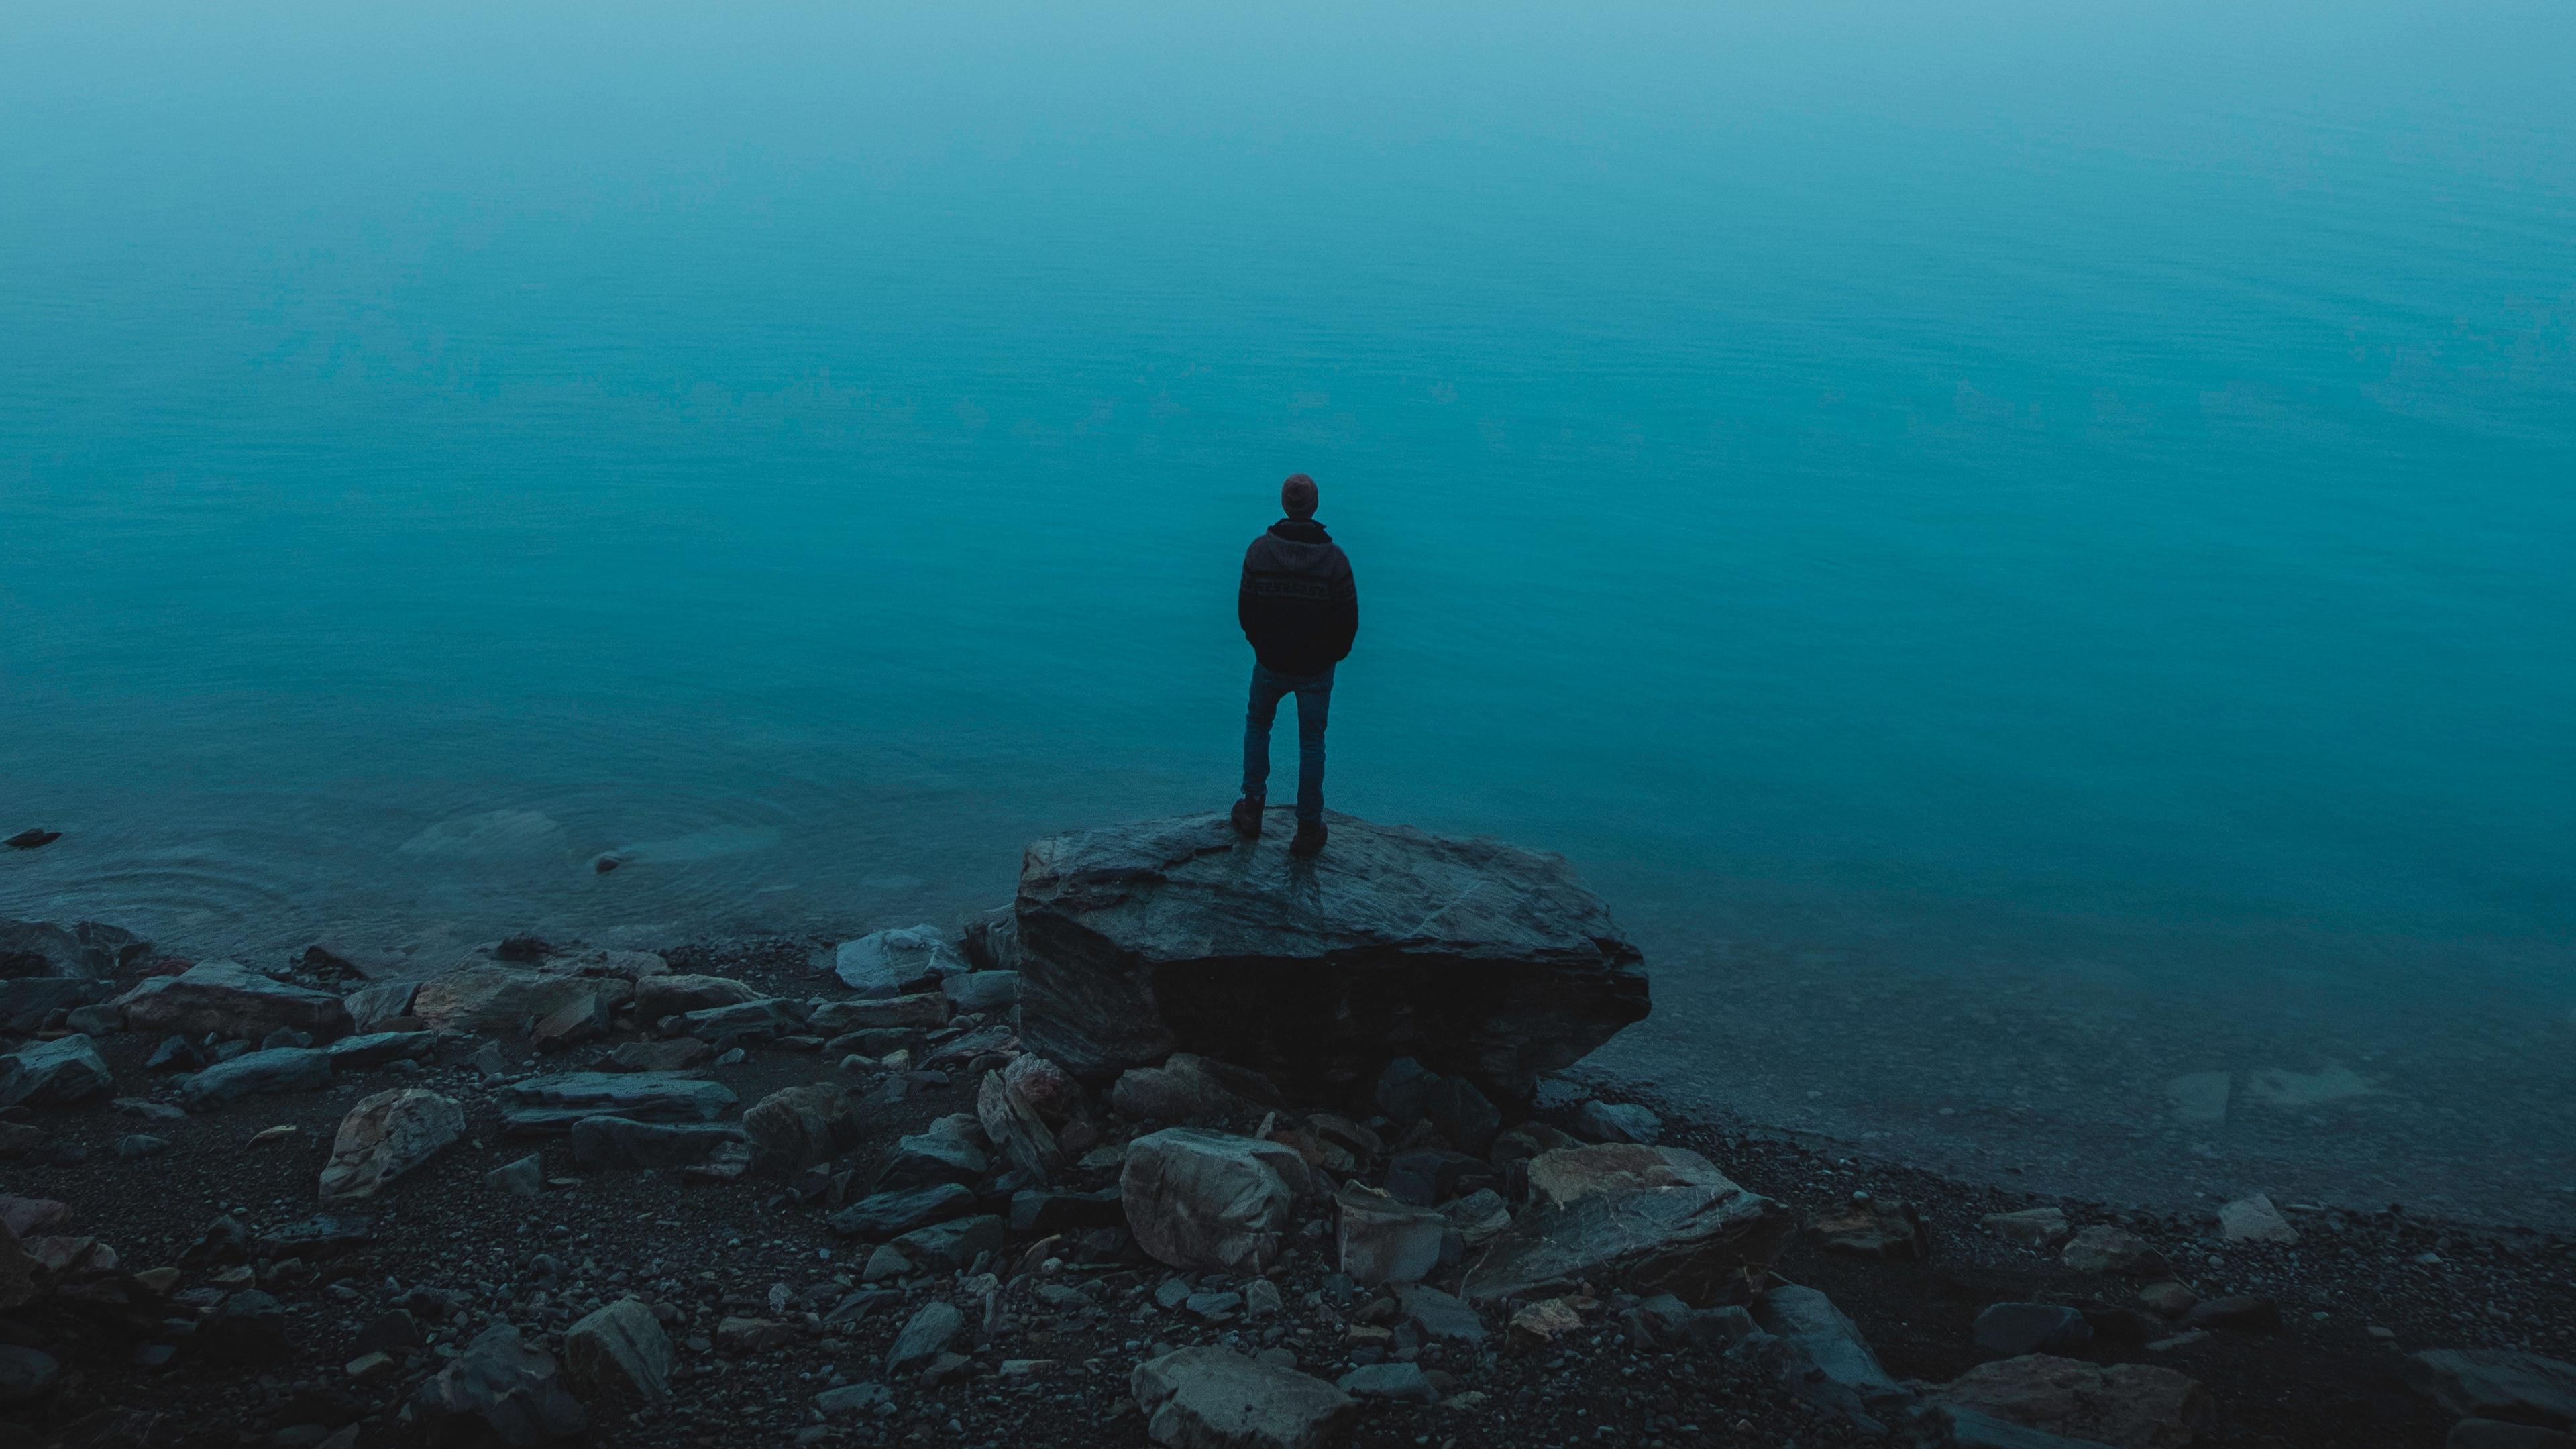 man sea stones loneliness alone 4k 1541115233 - man, sea, stones, loneliness, alone 4k - Stones, Sea, Man